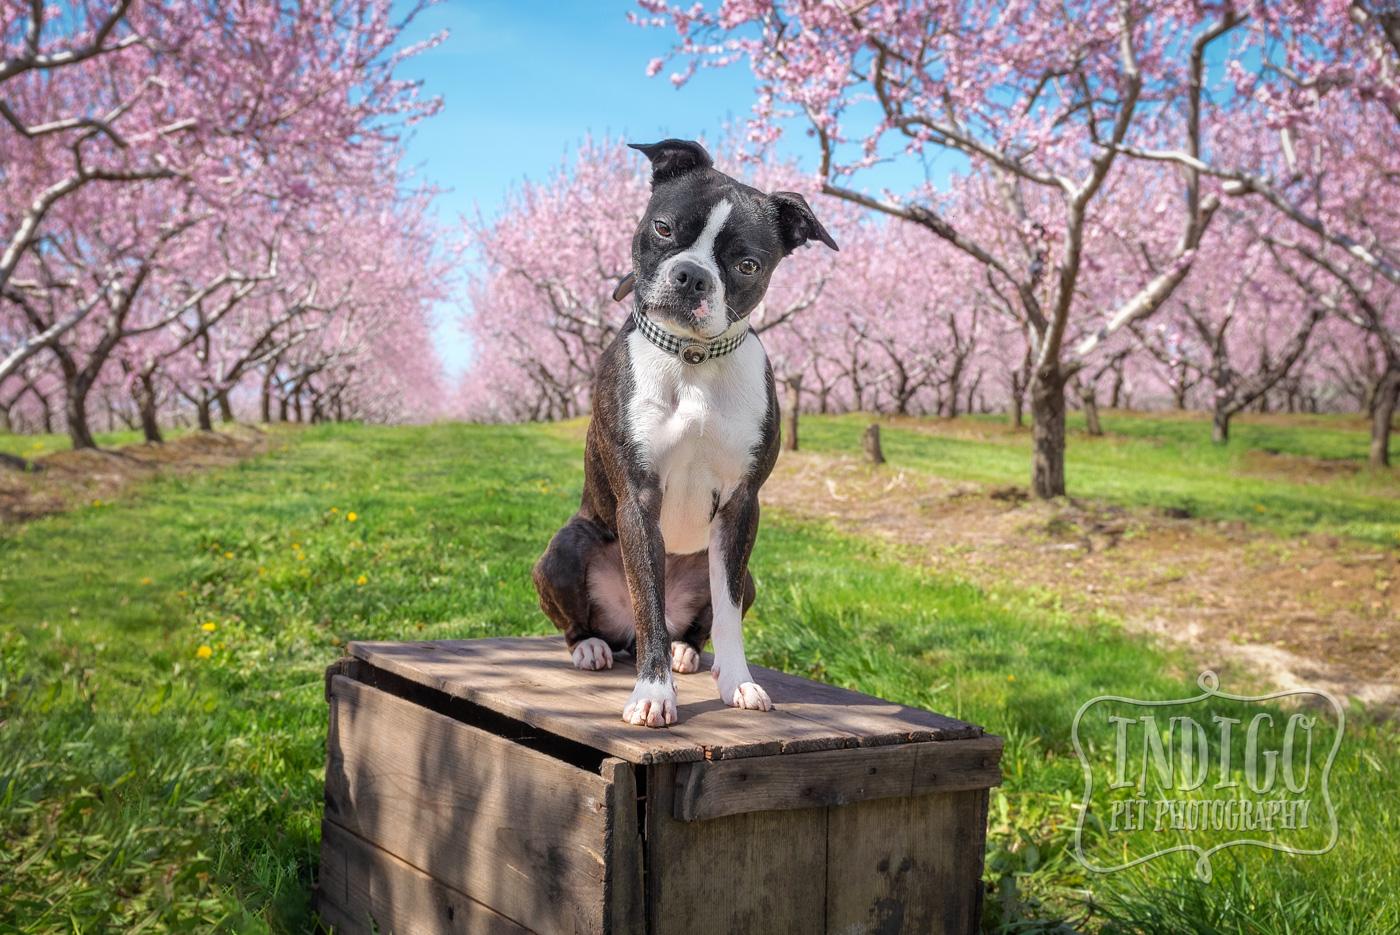 Keri's Breeze, the wonder Boston Terrier